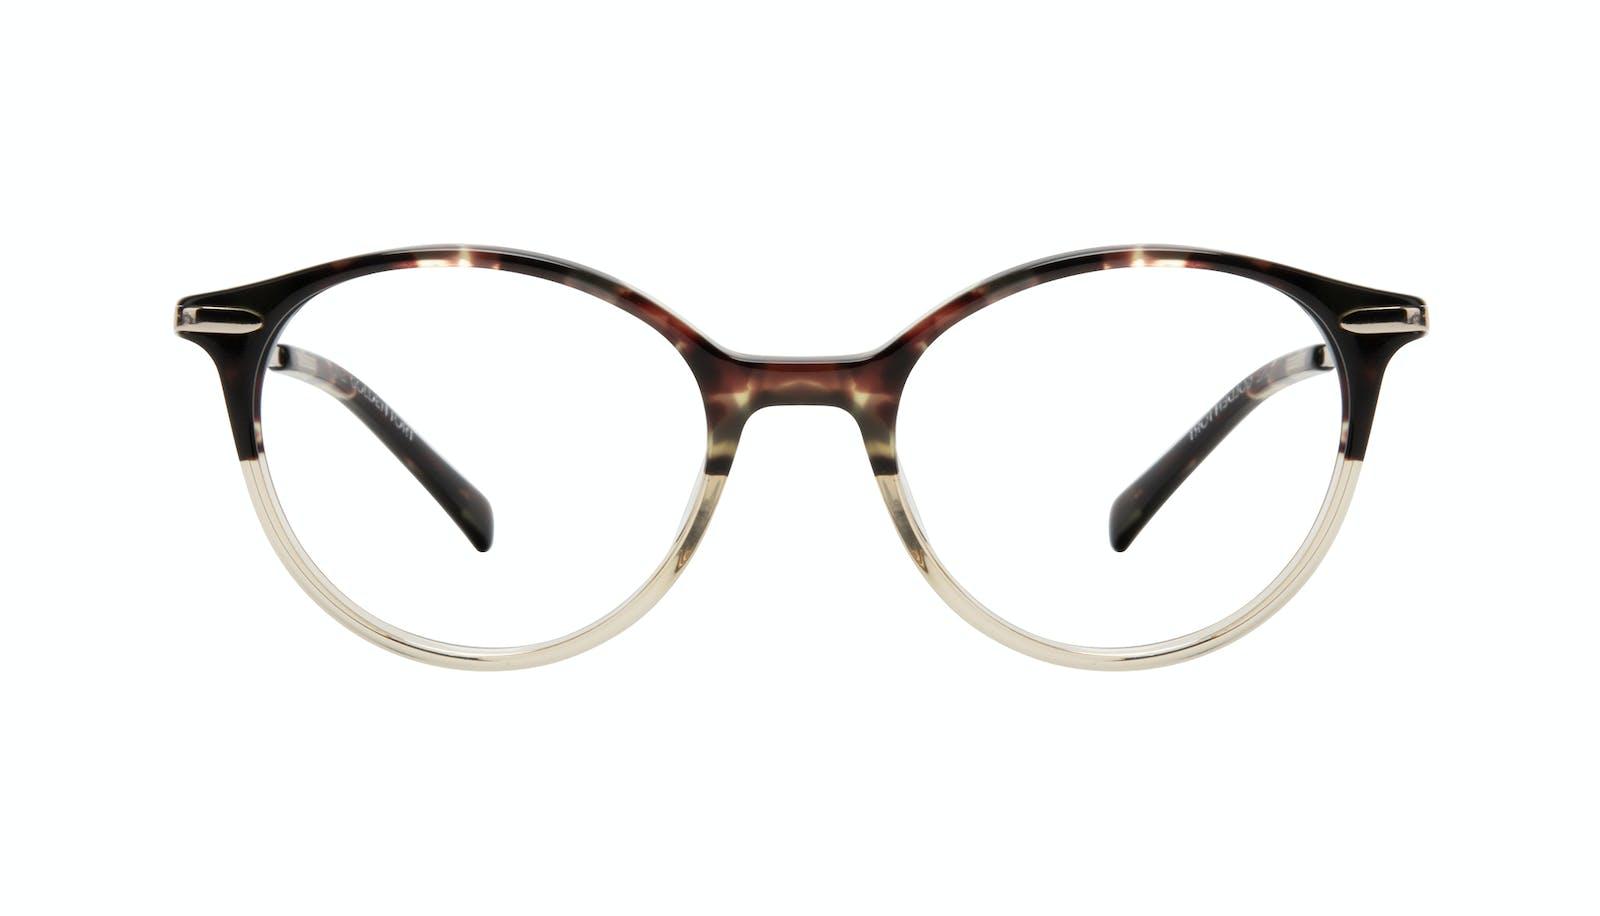 13748a0b3b5 Affordable Fashion Glasses Round Eyeglasses Women One Golden Tort